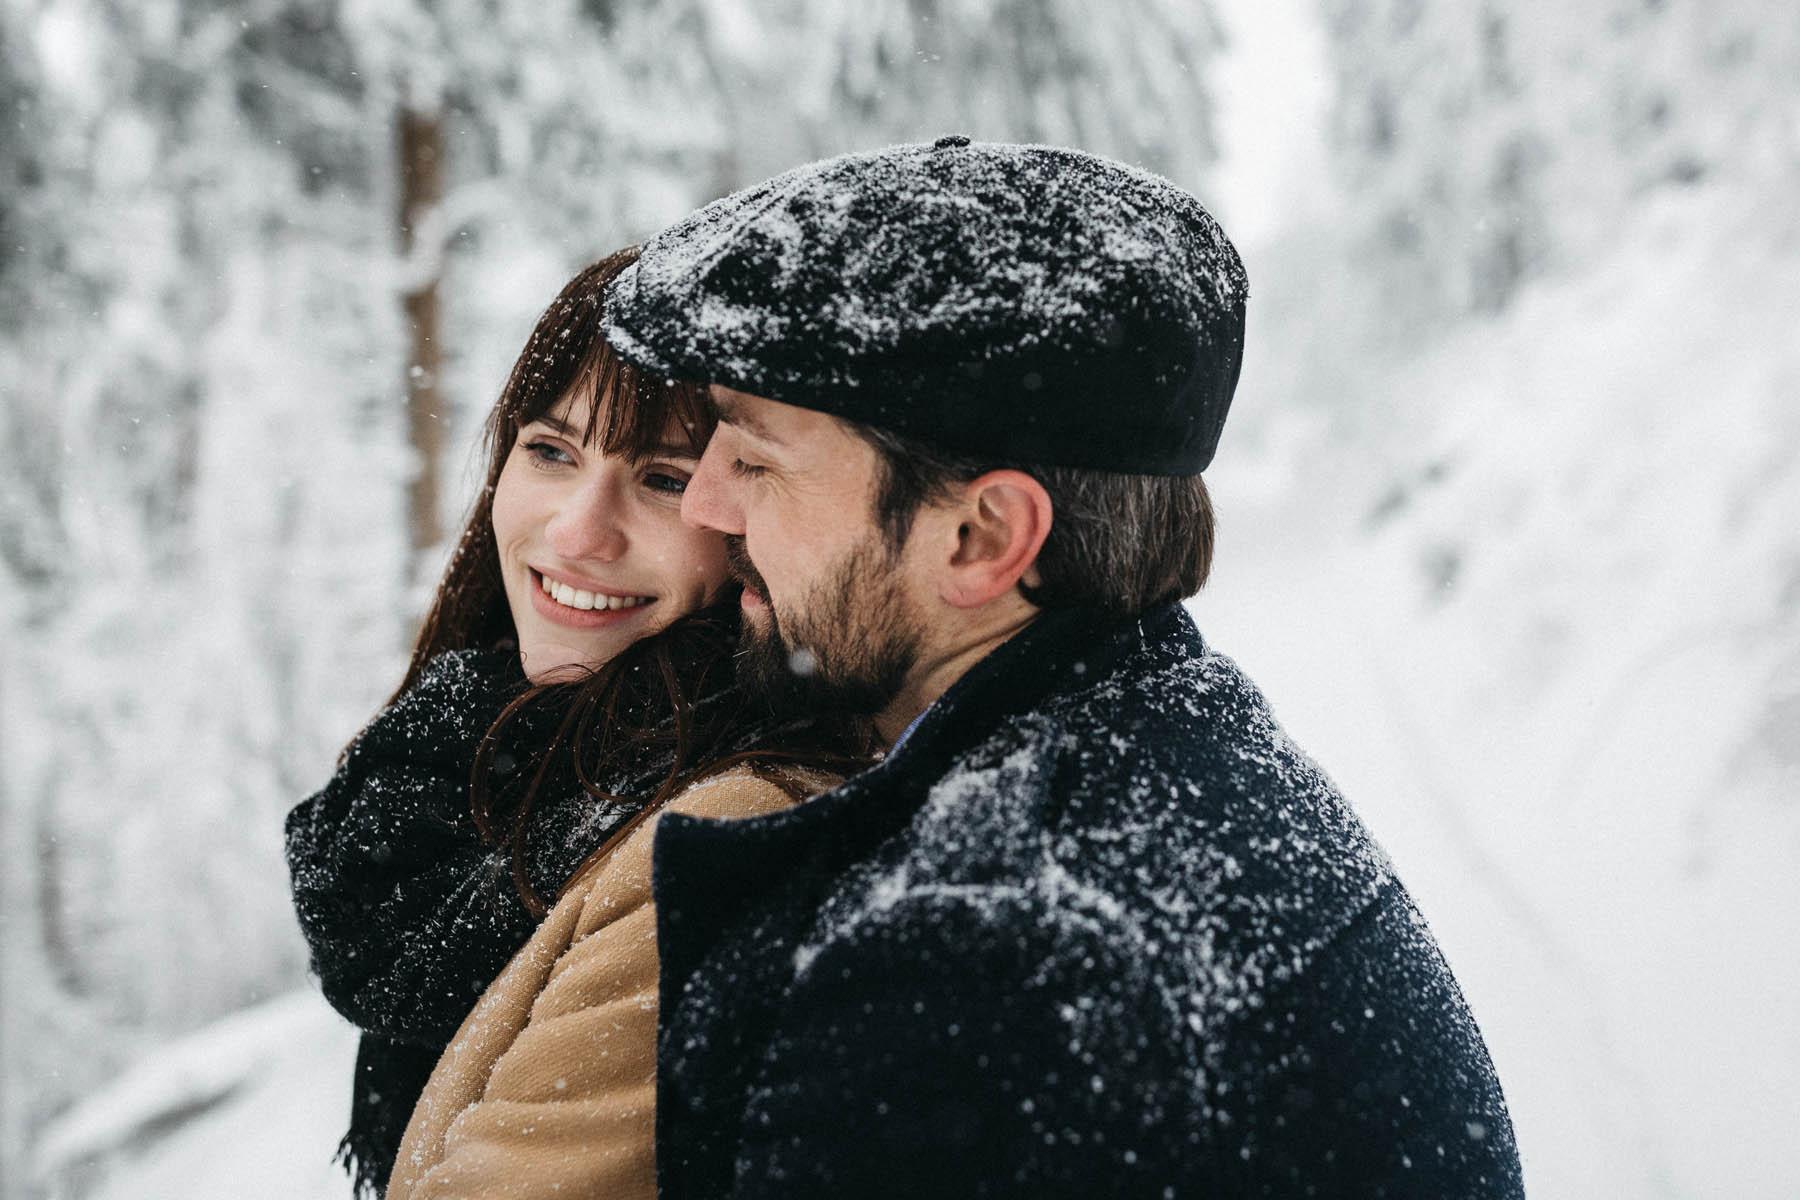 raissa simon fotografie paarshooting nais andre winter schwarzwaldhochstrasse 22 - Naïs + André